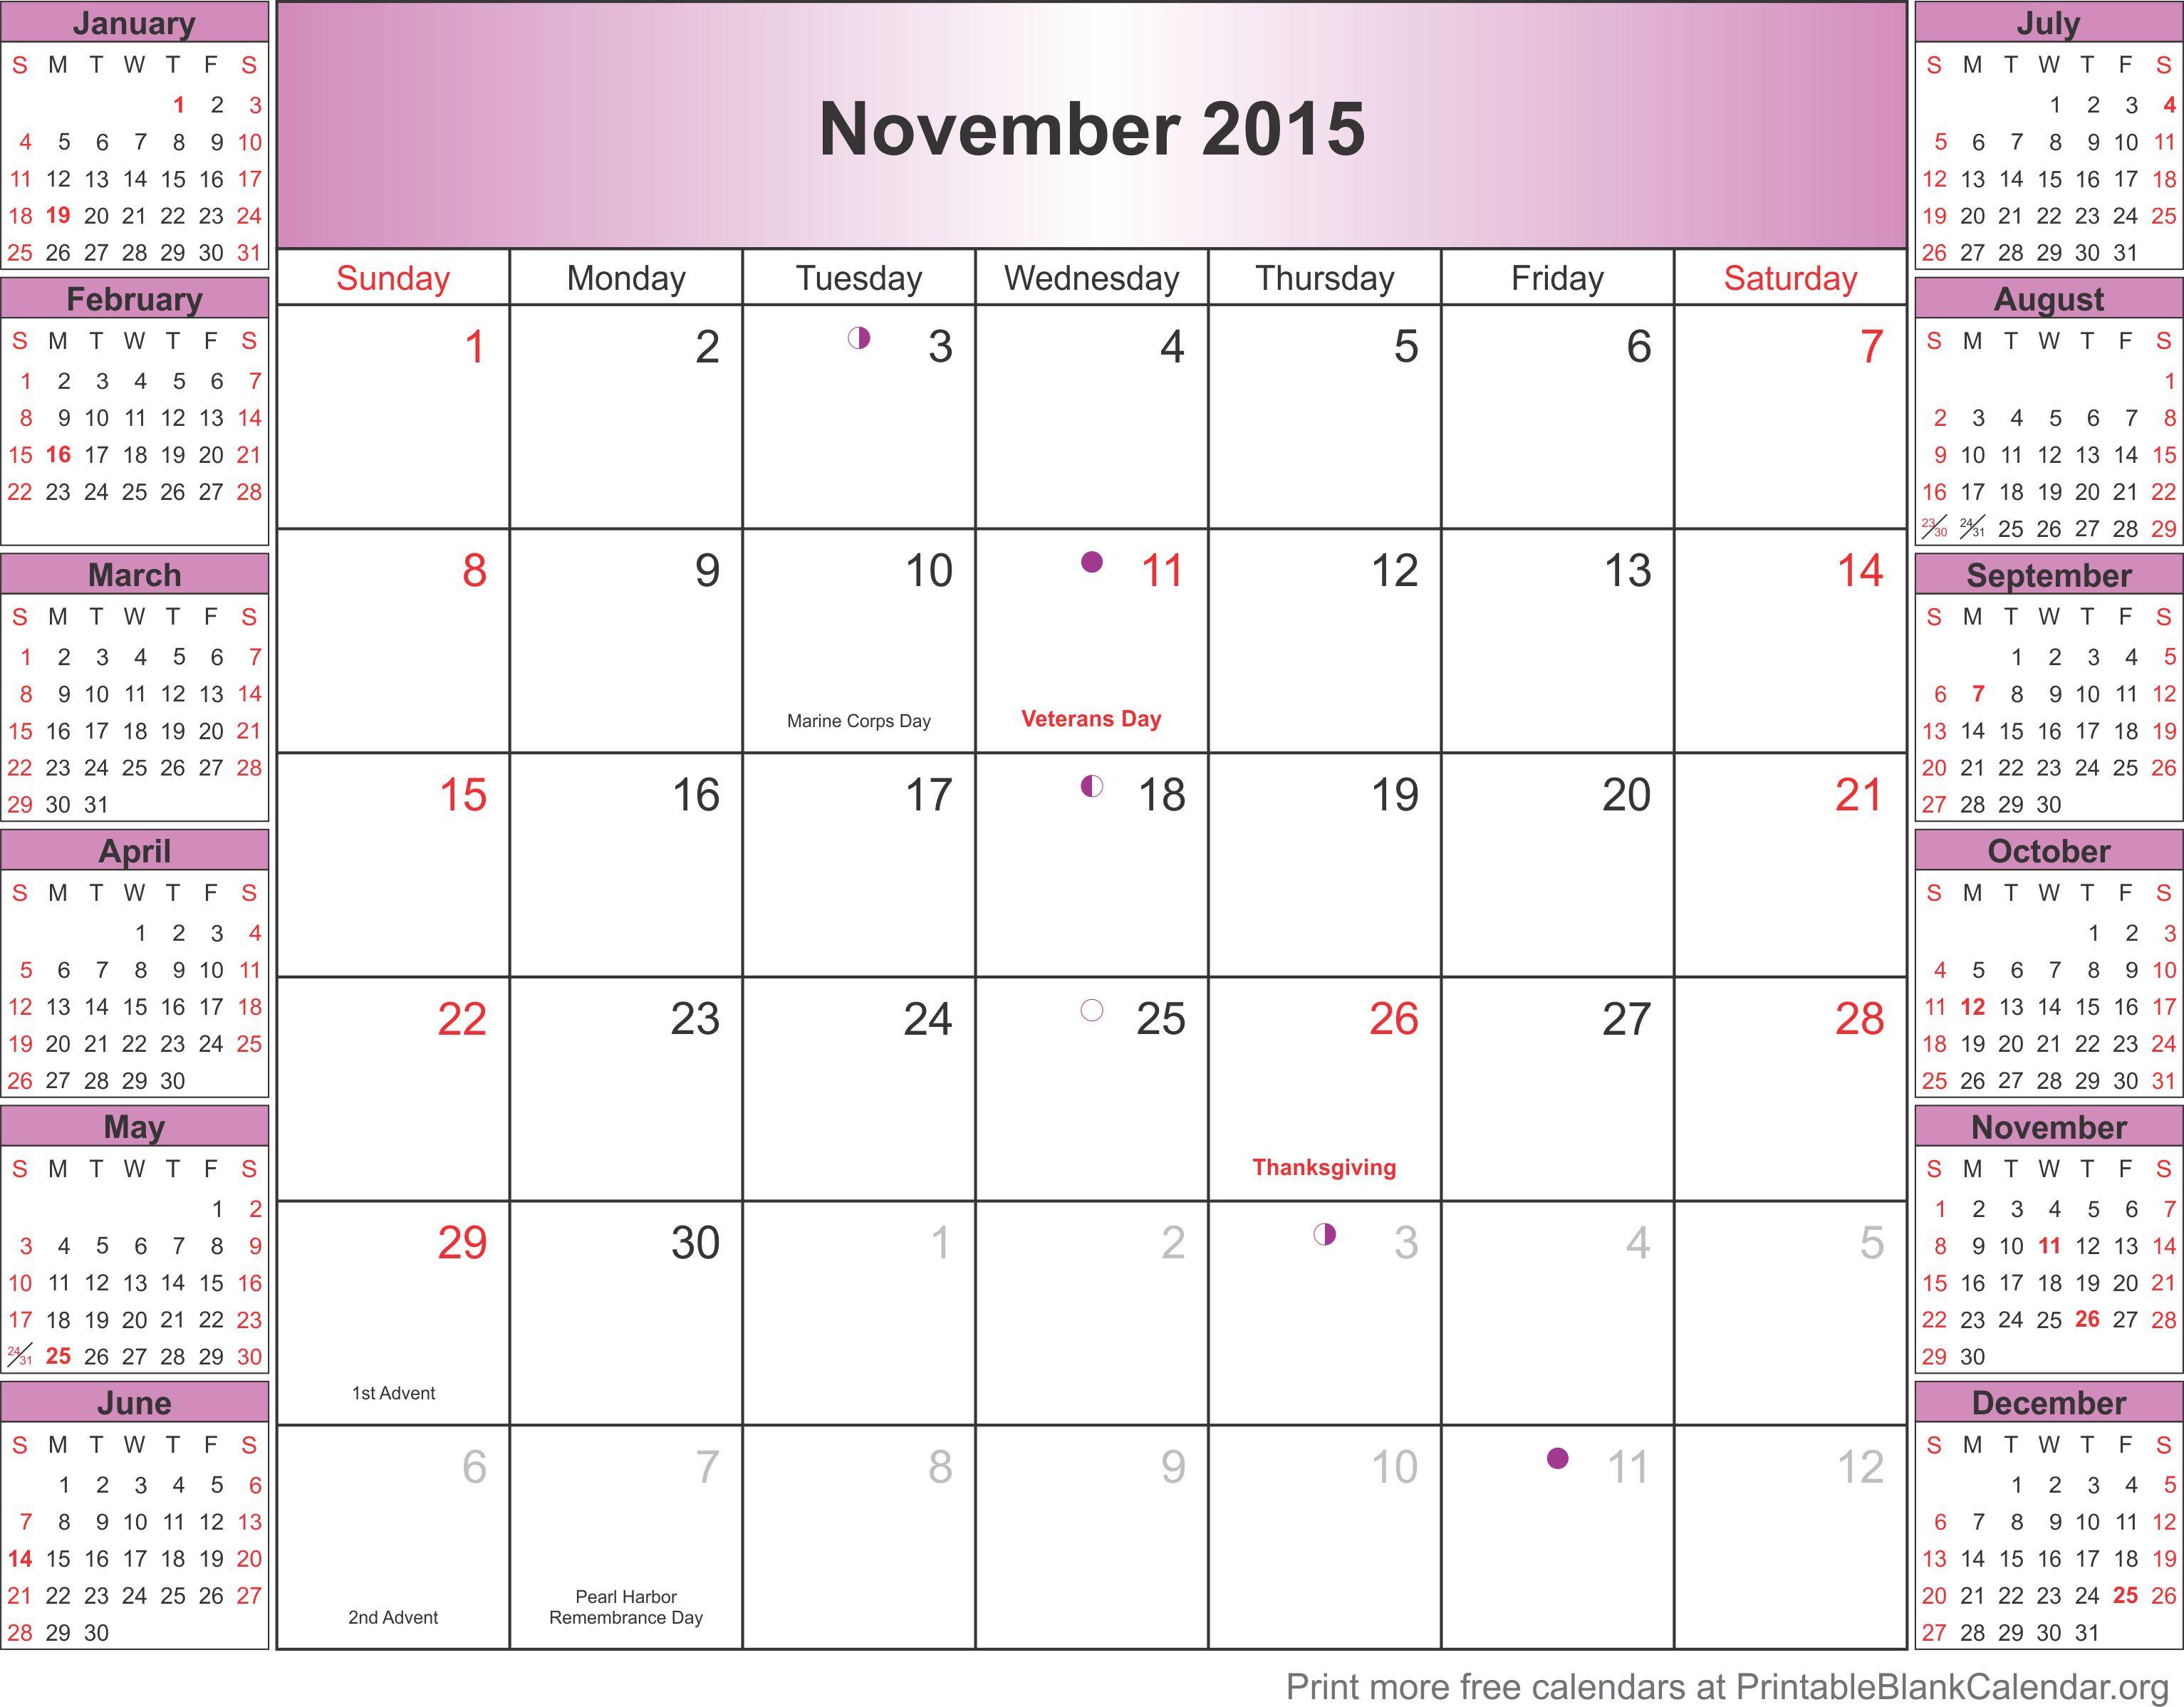 November 2015 Printable Calendar - Printable Blank Calendar.org